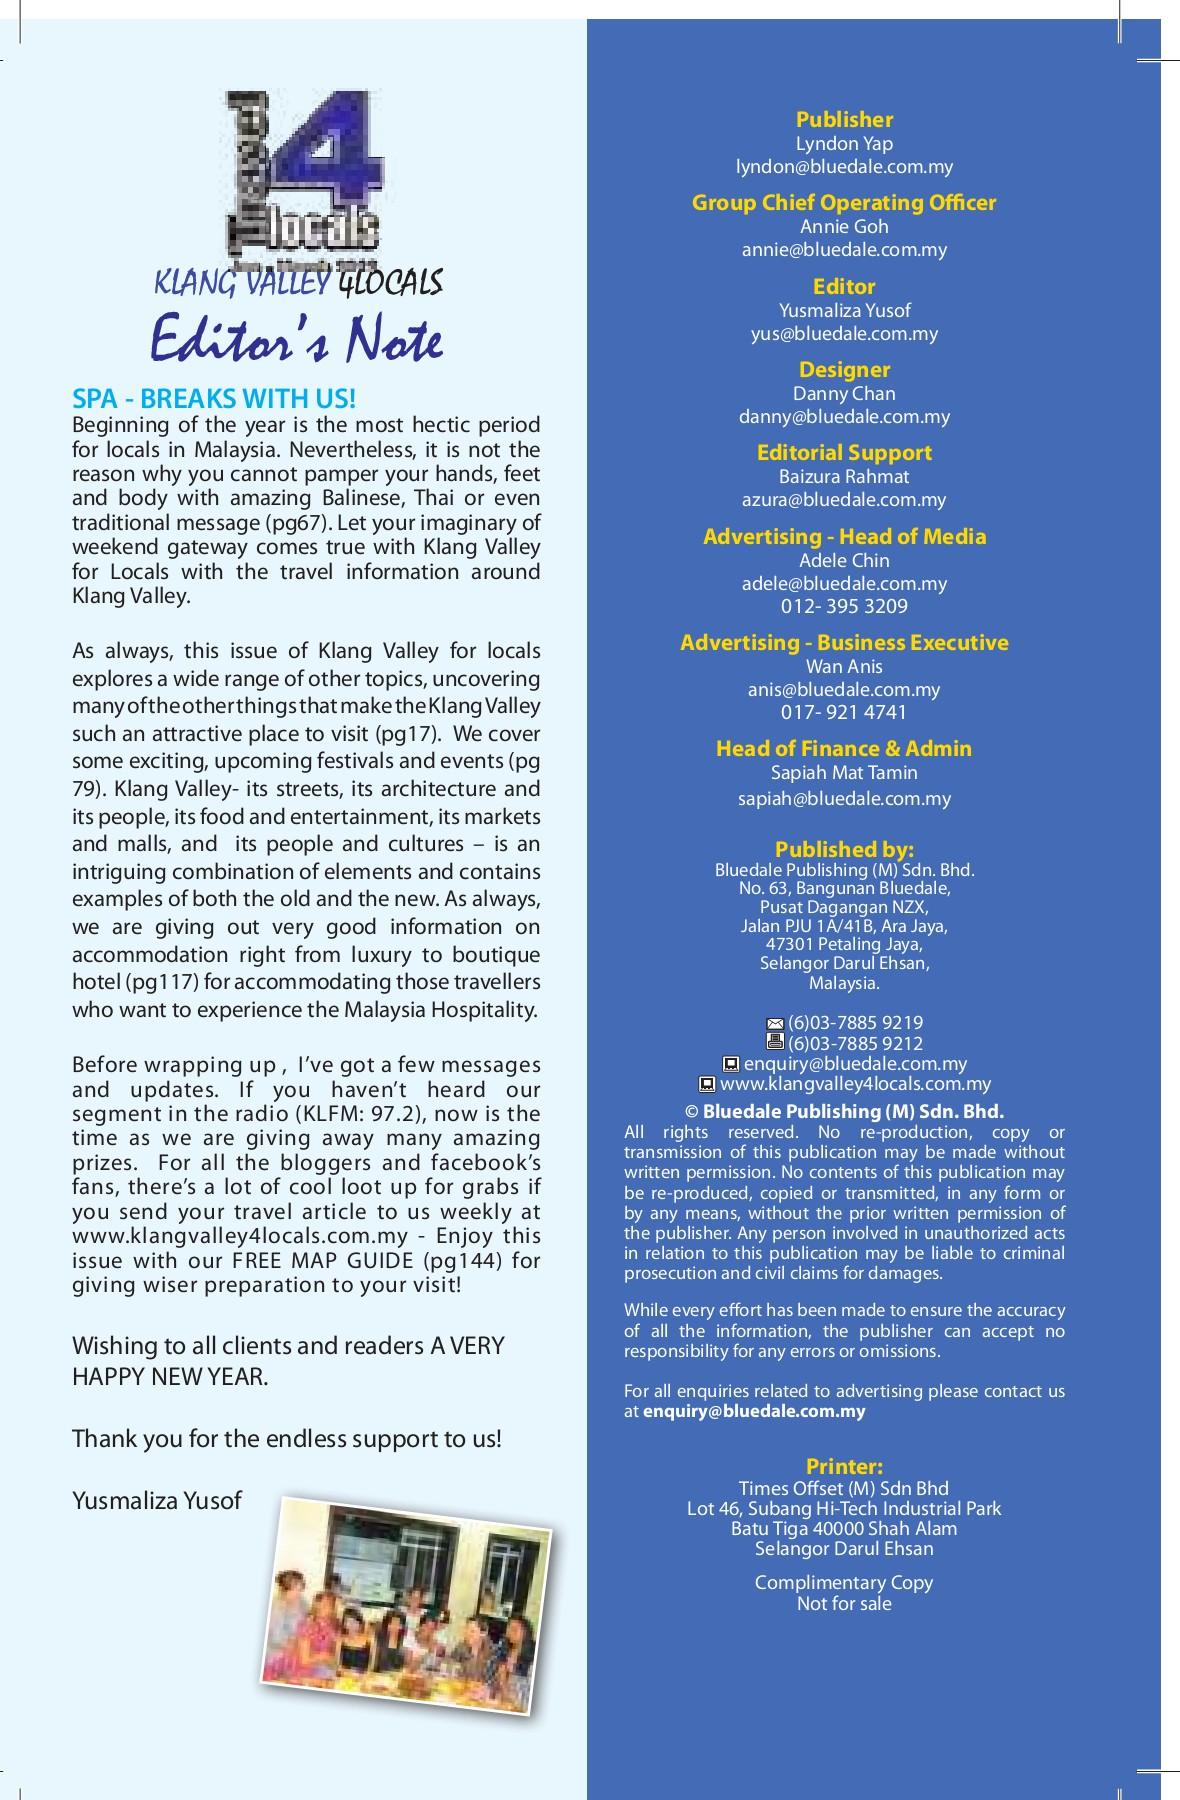 New Zealand Exchange - Wikipedia bahasa Indonesia, ensiklopedia bebas